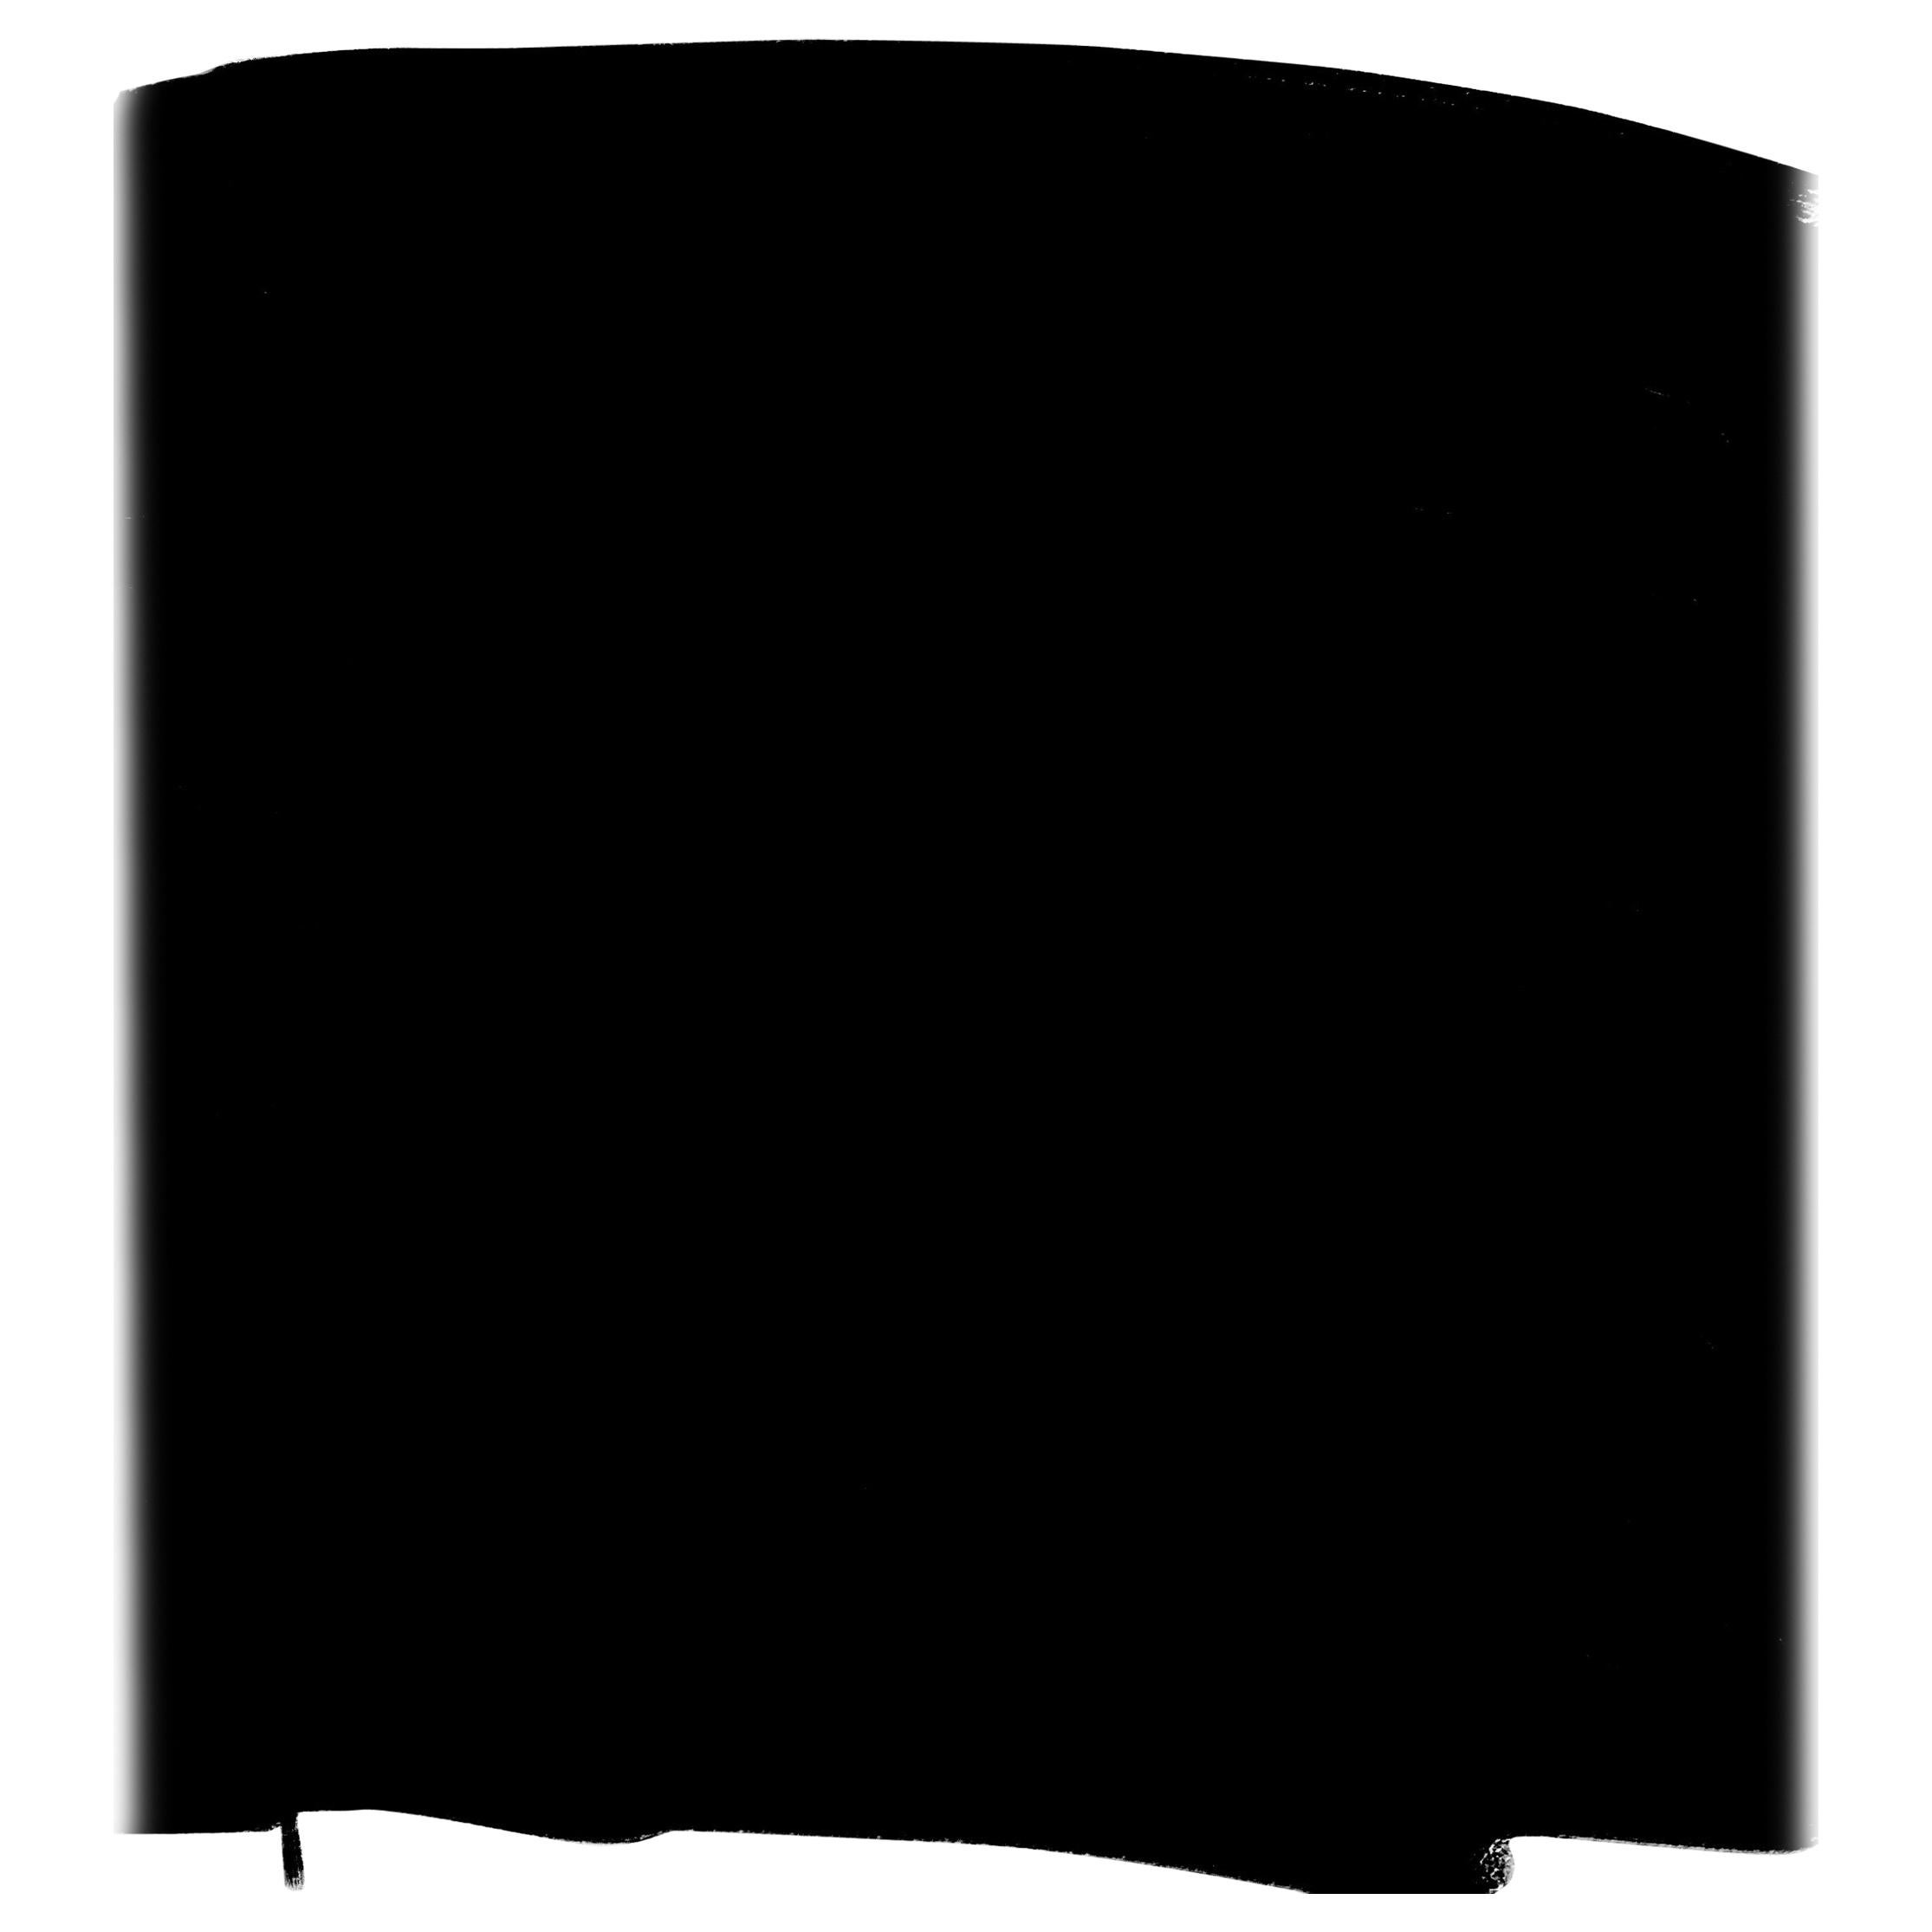 "Minimalist Oil on Canvas ""Heft"" ,2018 by BT Newton, Black & White Abstract"